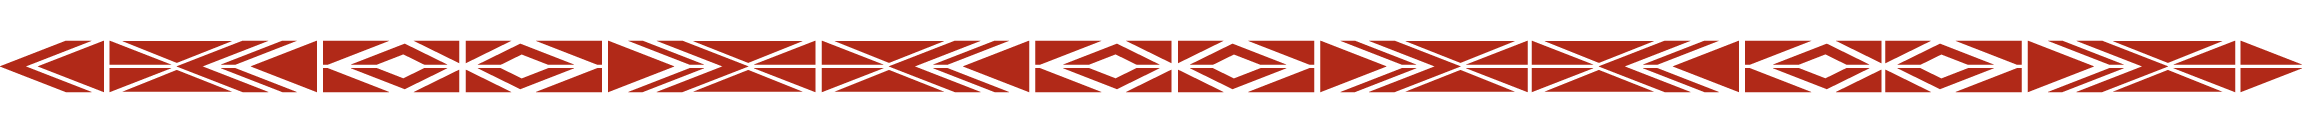 divider-aztec-pole.png